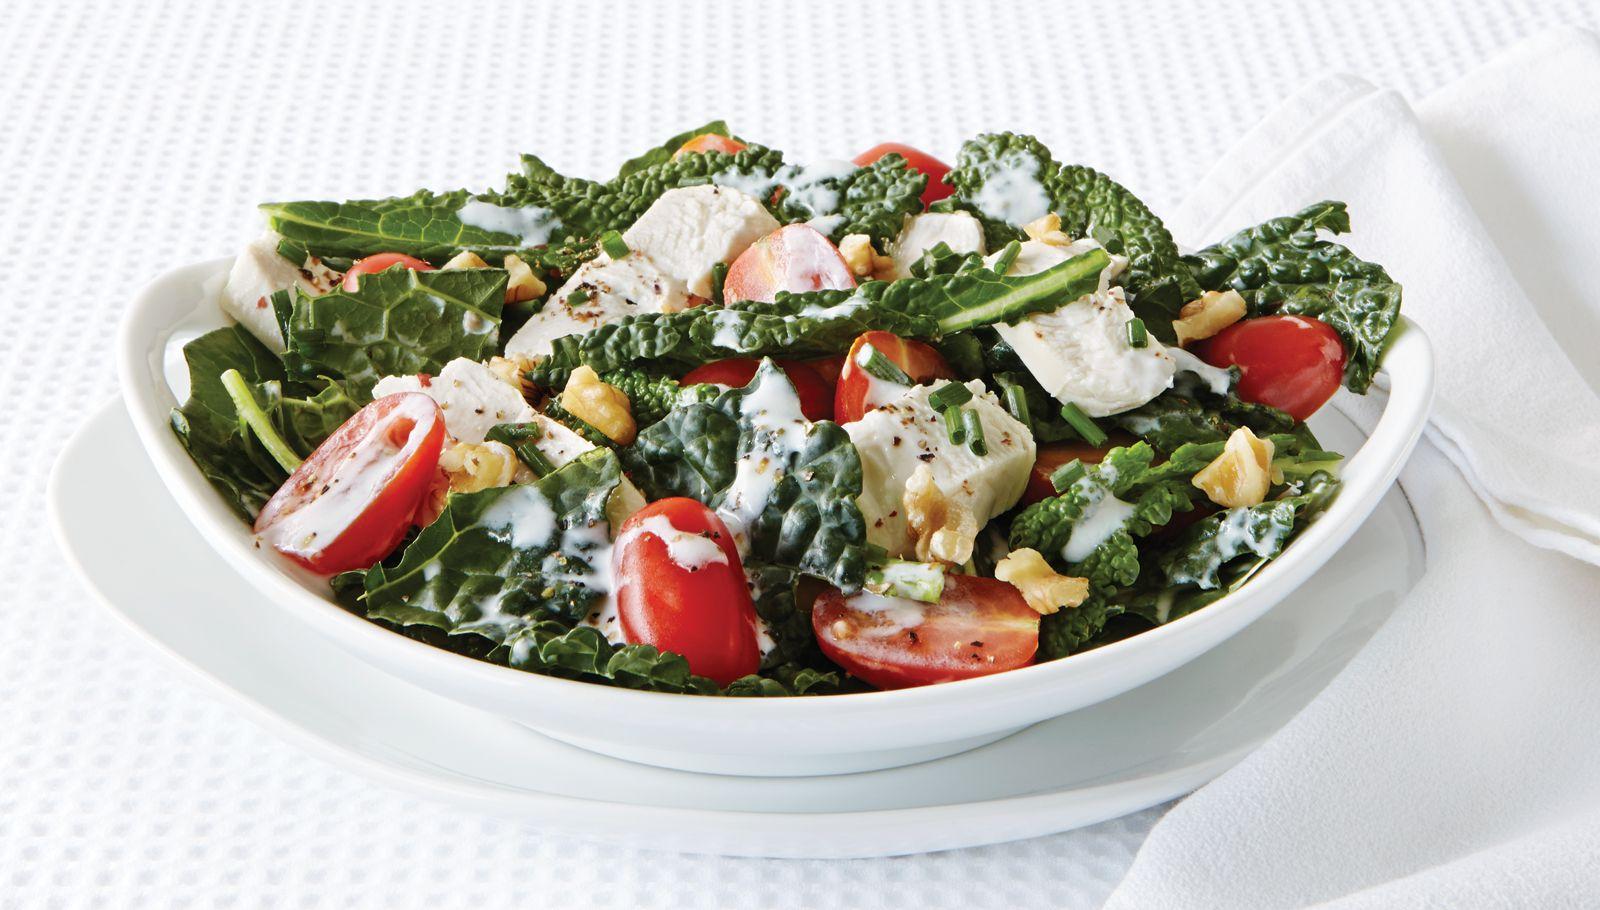 Bowl of Kale Caeaser salad.